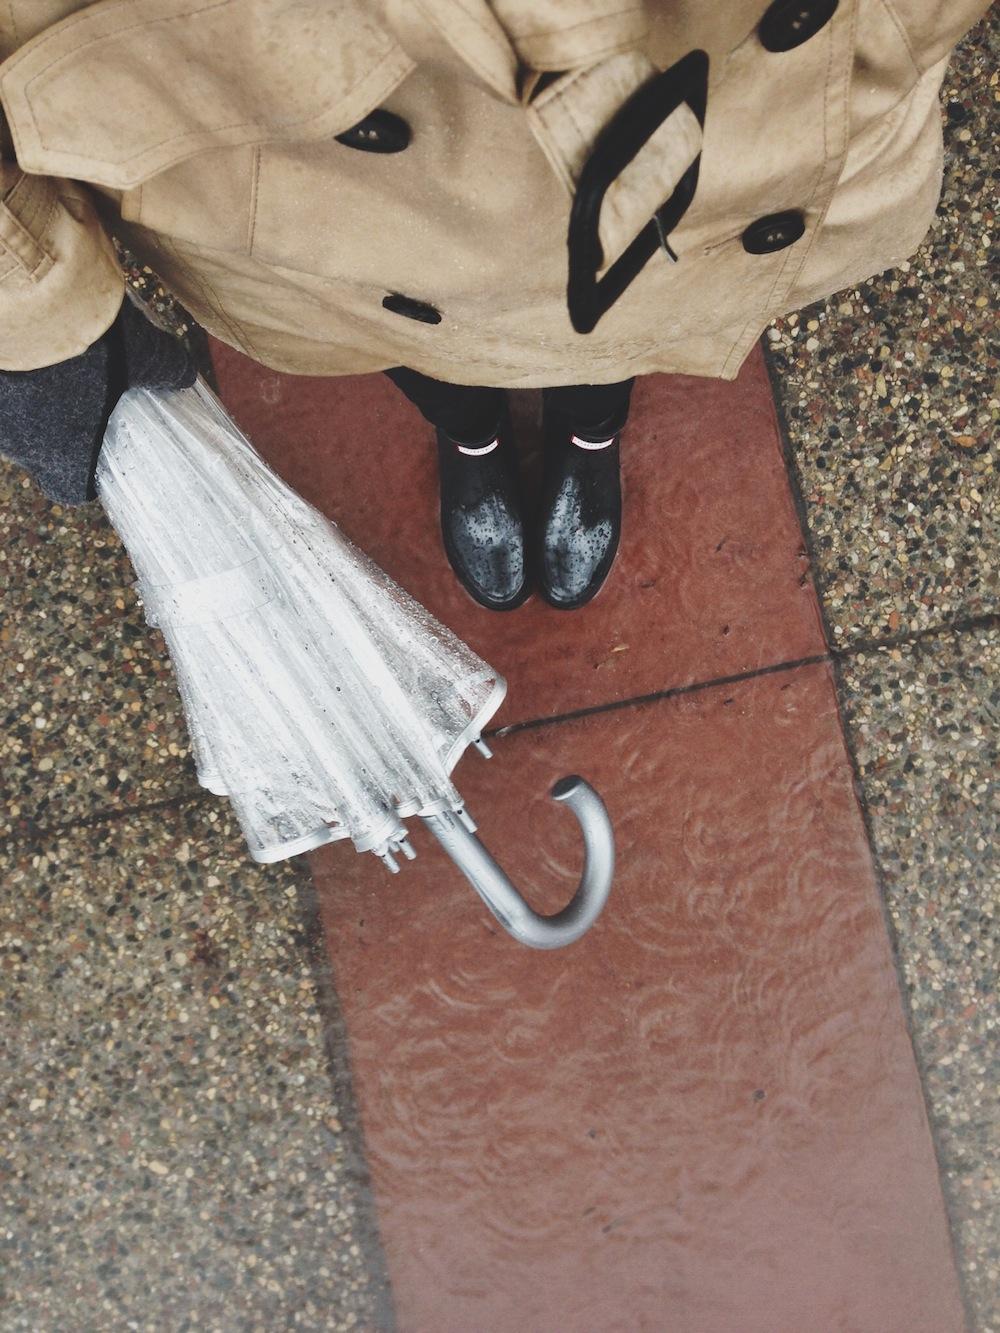 chelsea+lane+zipped+truelane+blog+joy+felicity+jane+making+lists+guest+post1.jpg